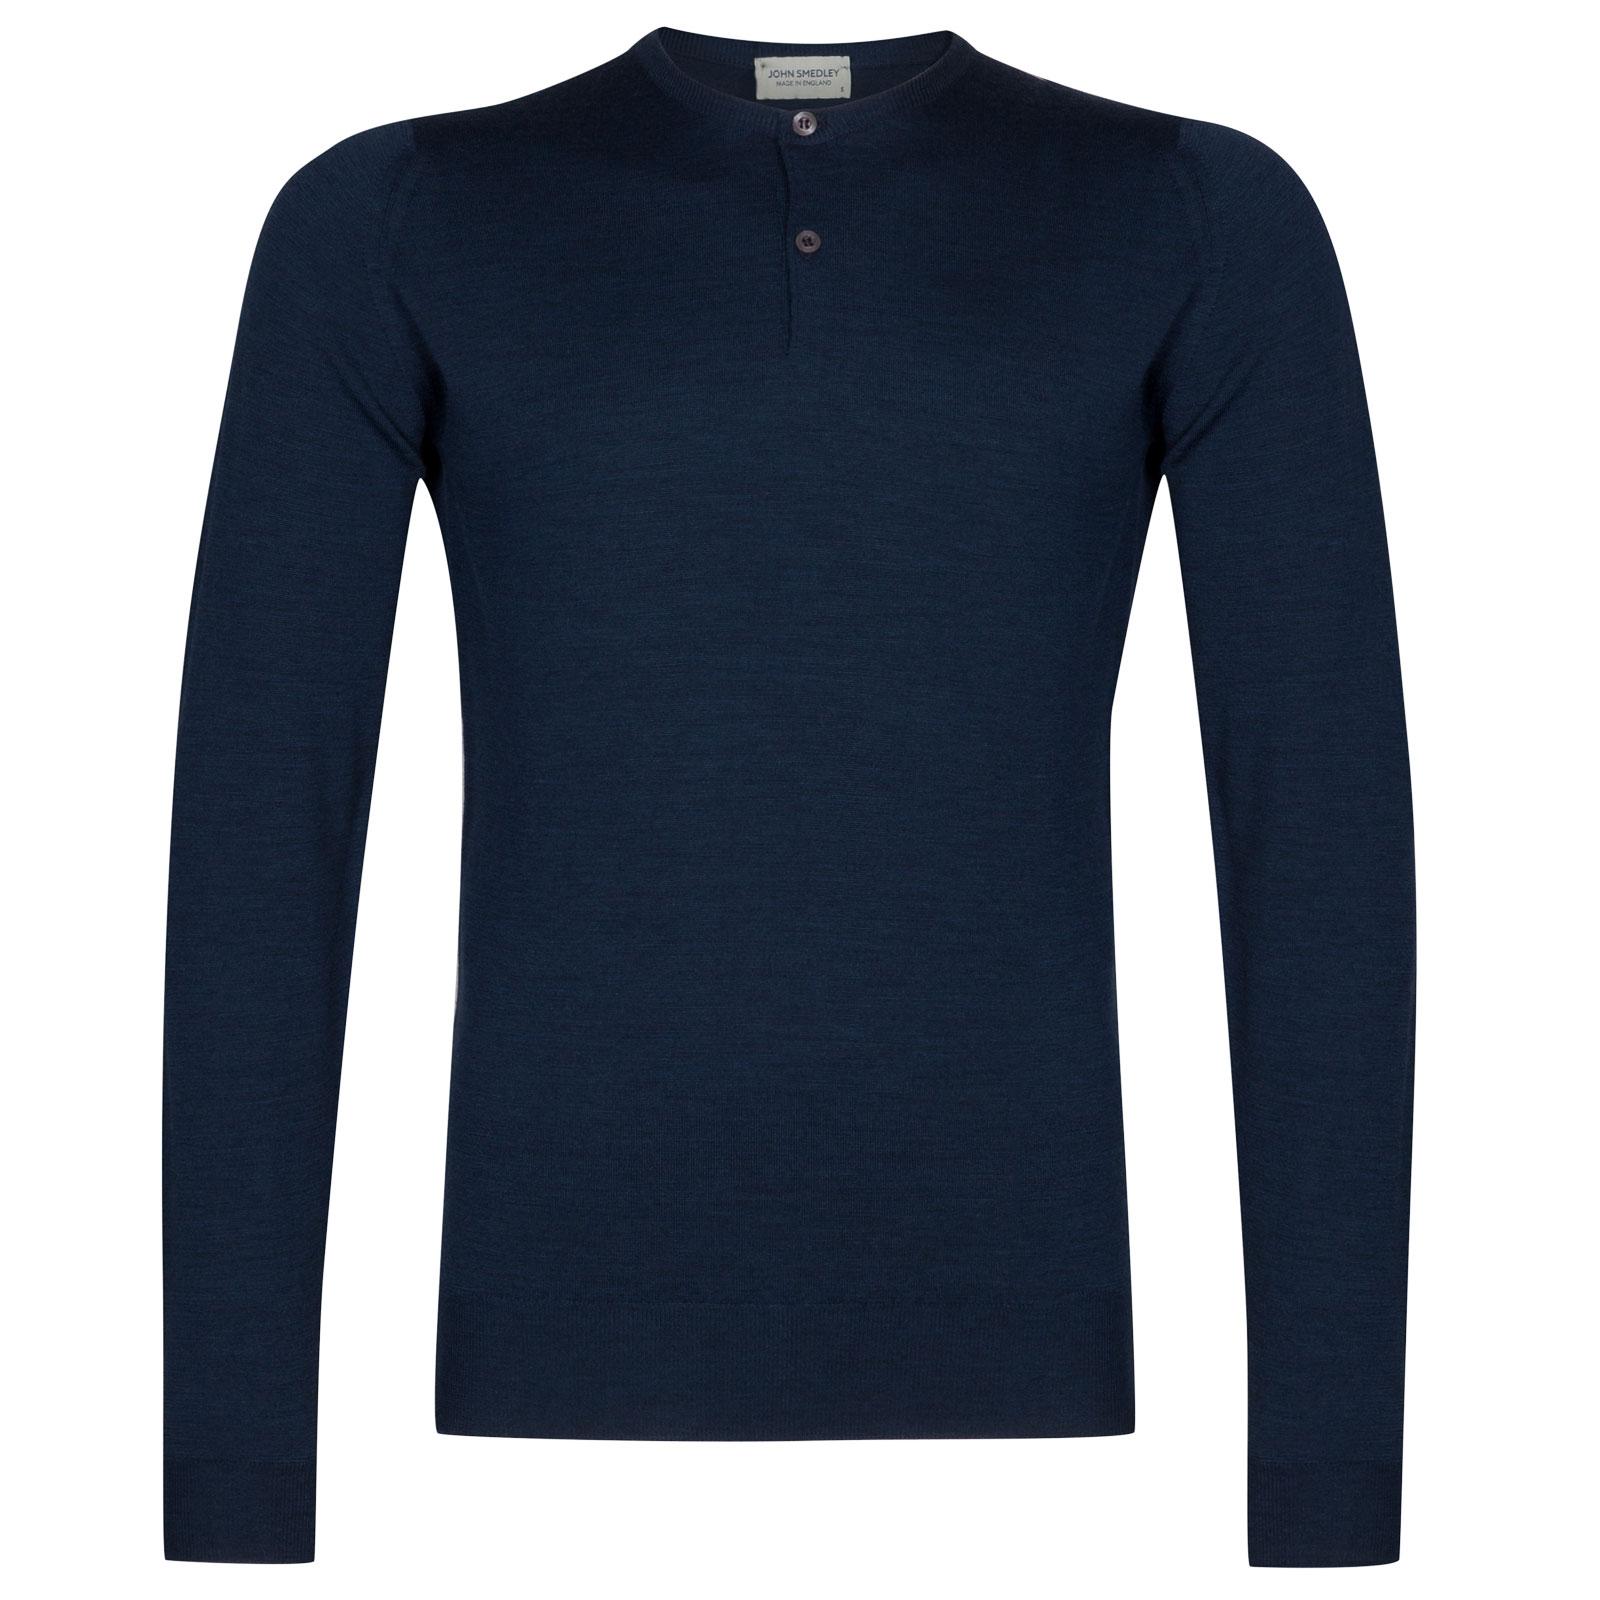 John Smedley russet Merino Wool Henley Shirt in Indigo-XXL